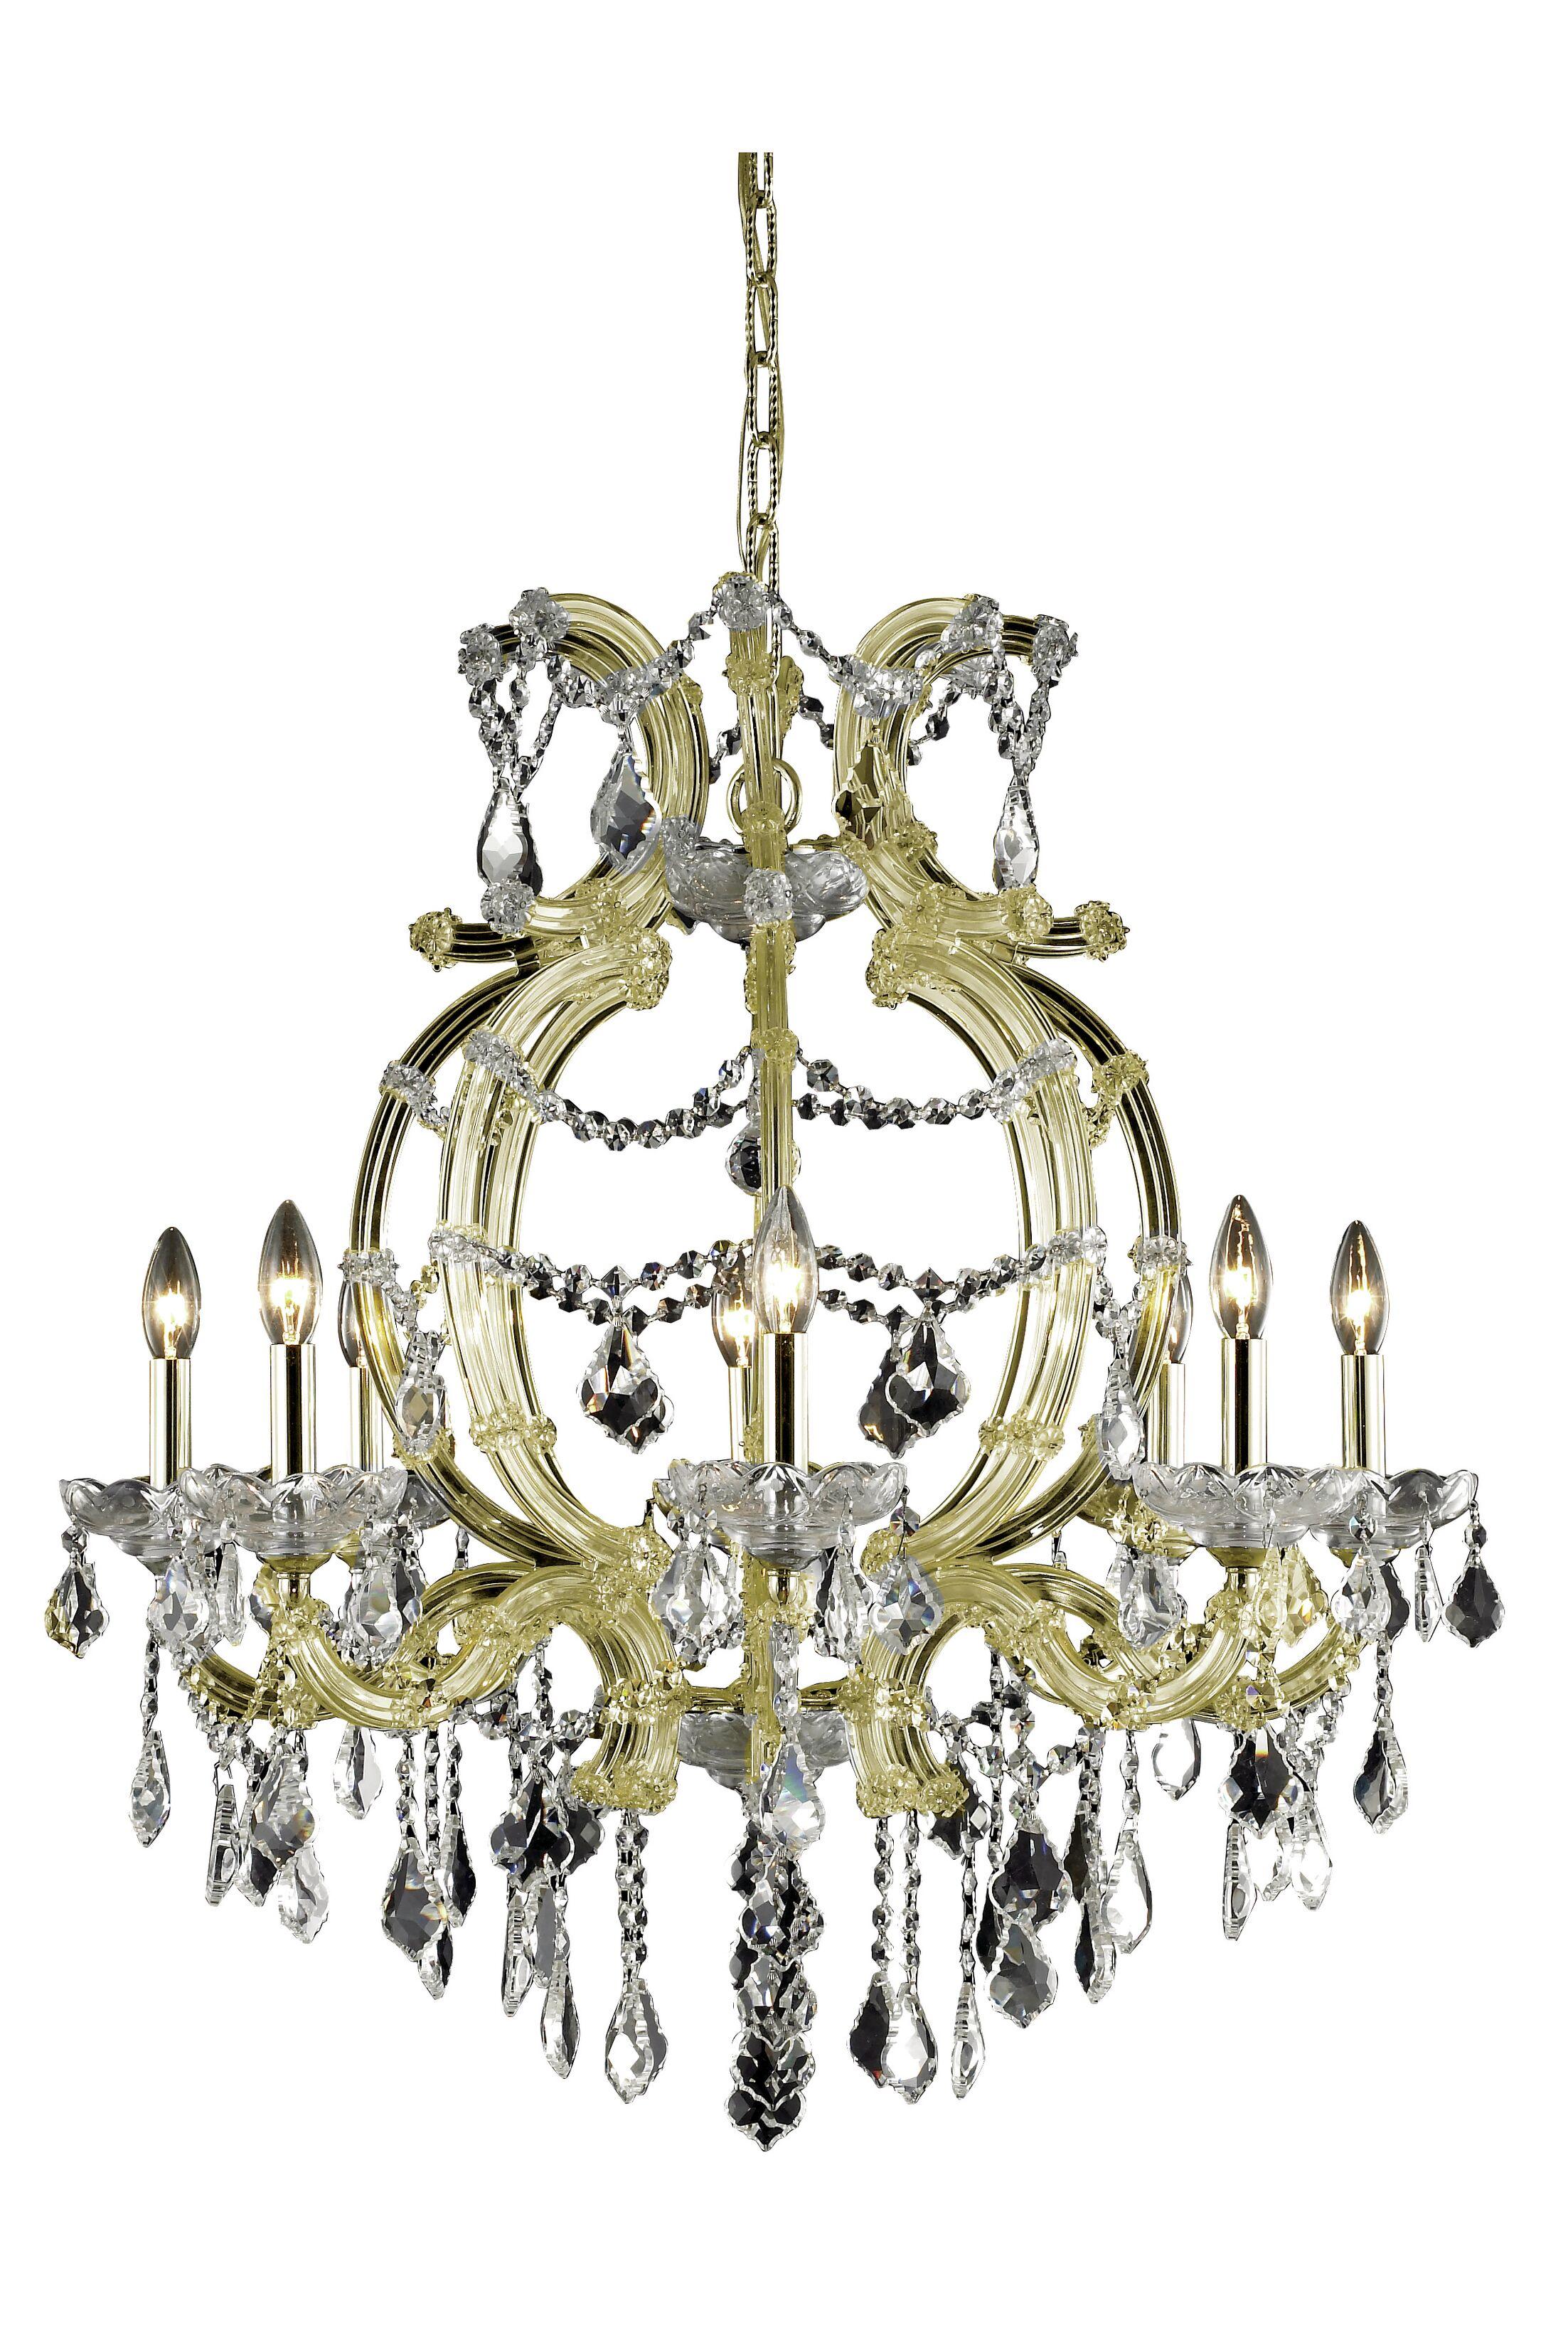 Regina 8-Light Candle Style Chandelier Finish: Gold, Crystal Grade: Spectra Swarovski